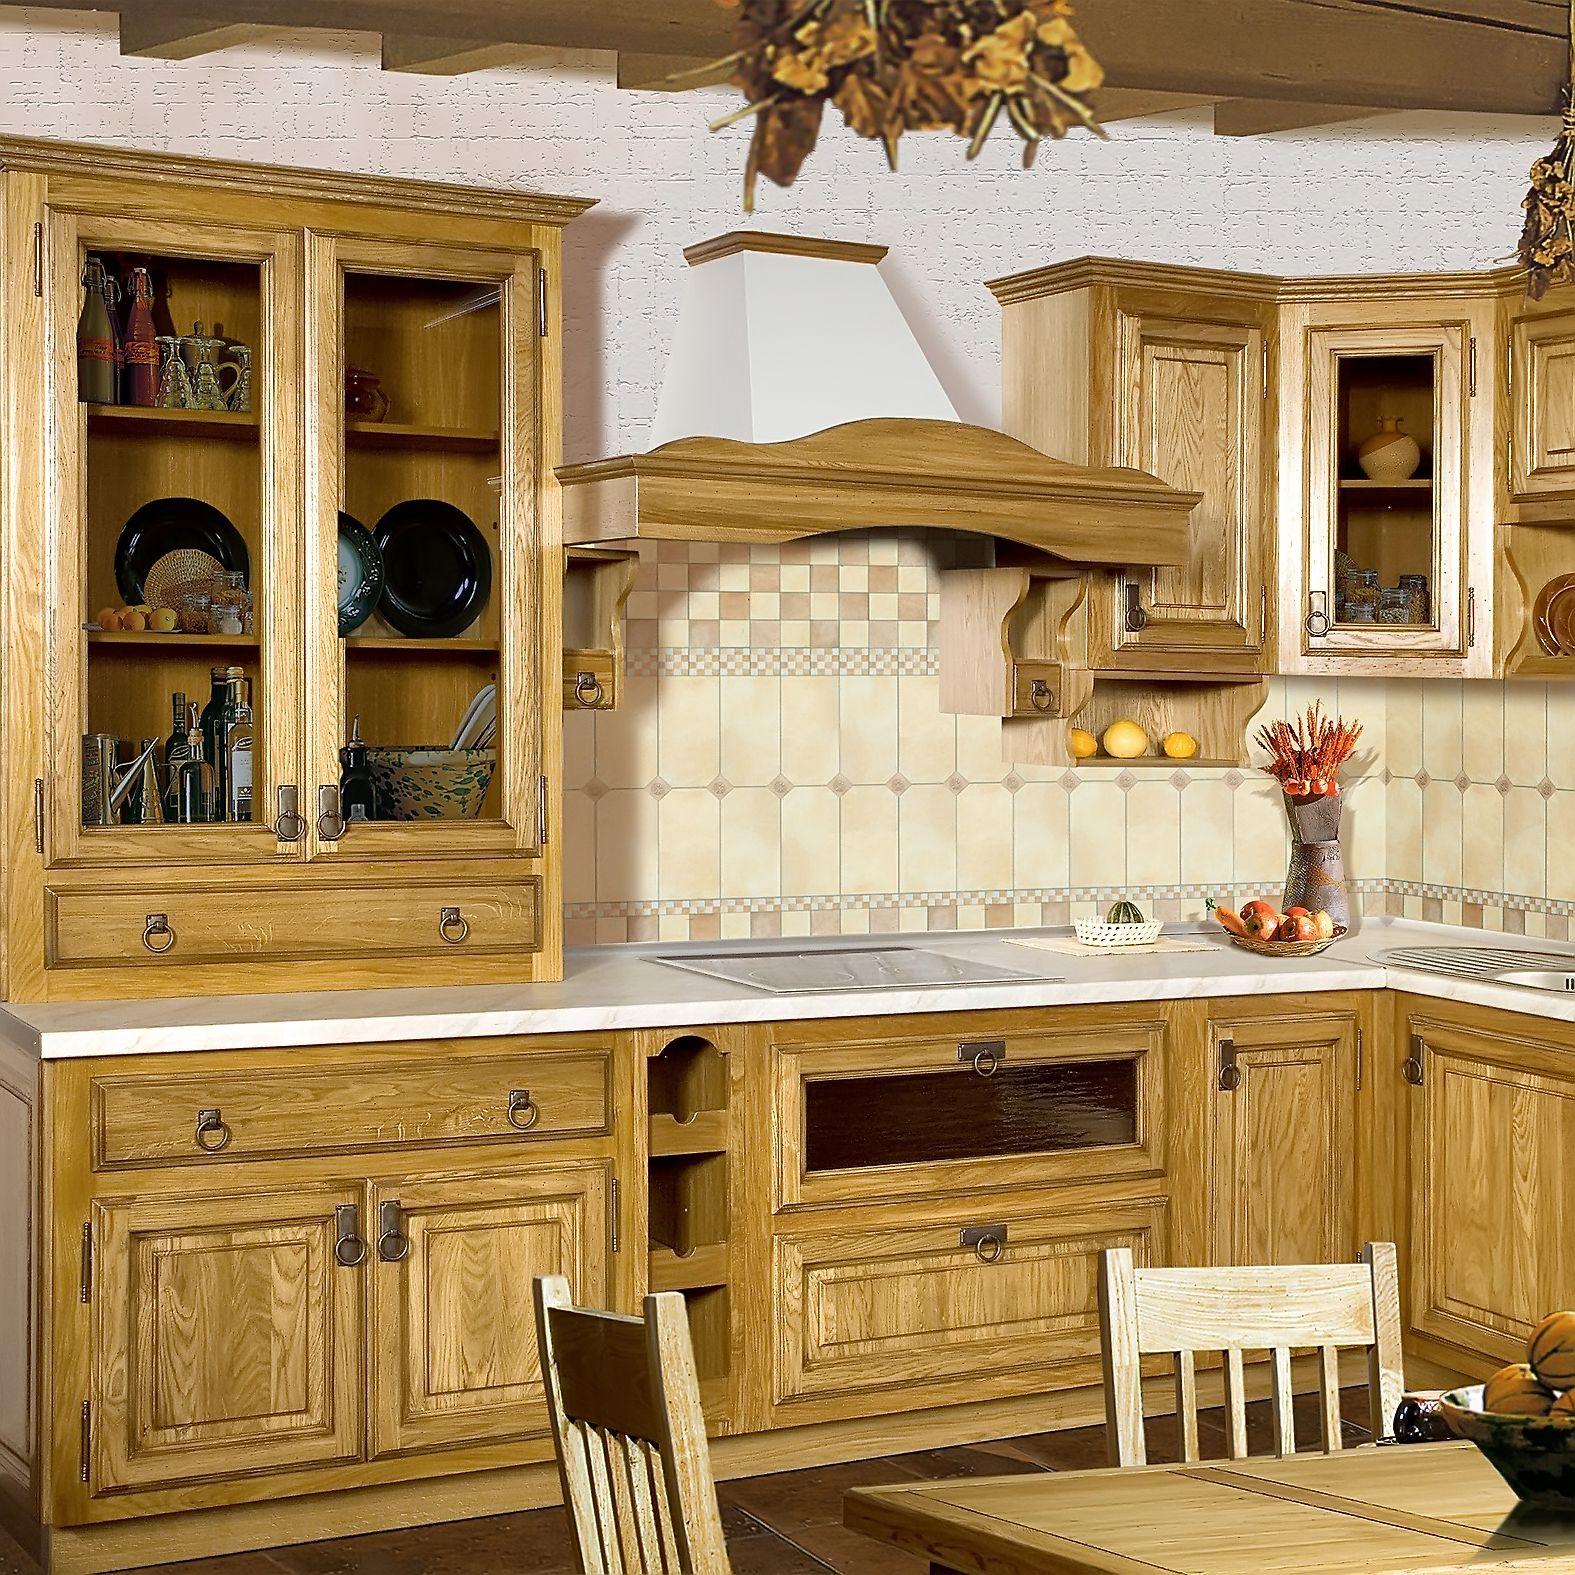 Full Size of Küchen Rustikal Rustikales Bett Regal Küche Esstisch Holz Rustikaler Wohnzimmer Küchen Rustikal